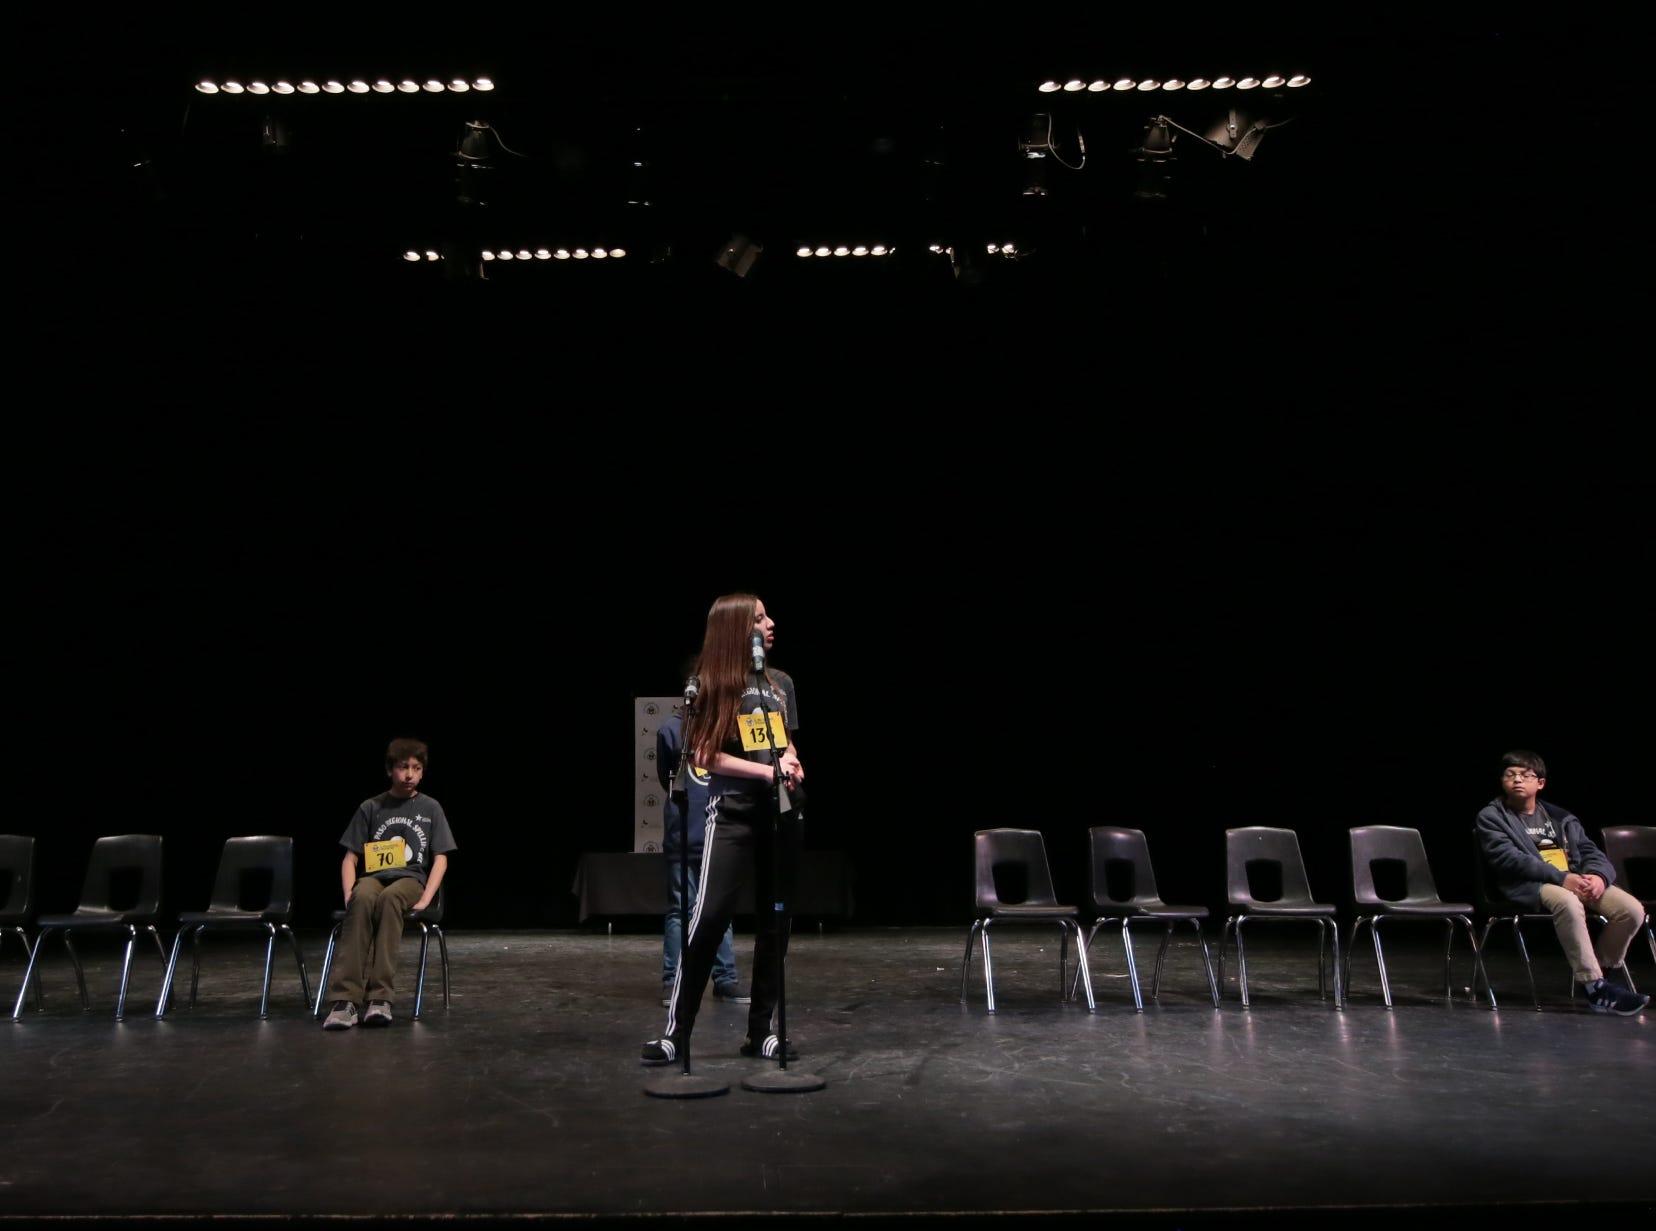 The top five spellers compete Saturday in the 2019 El Paso Regional Spelling Bee.